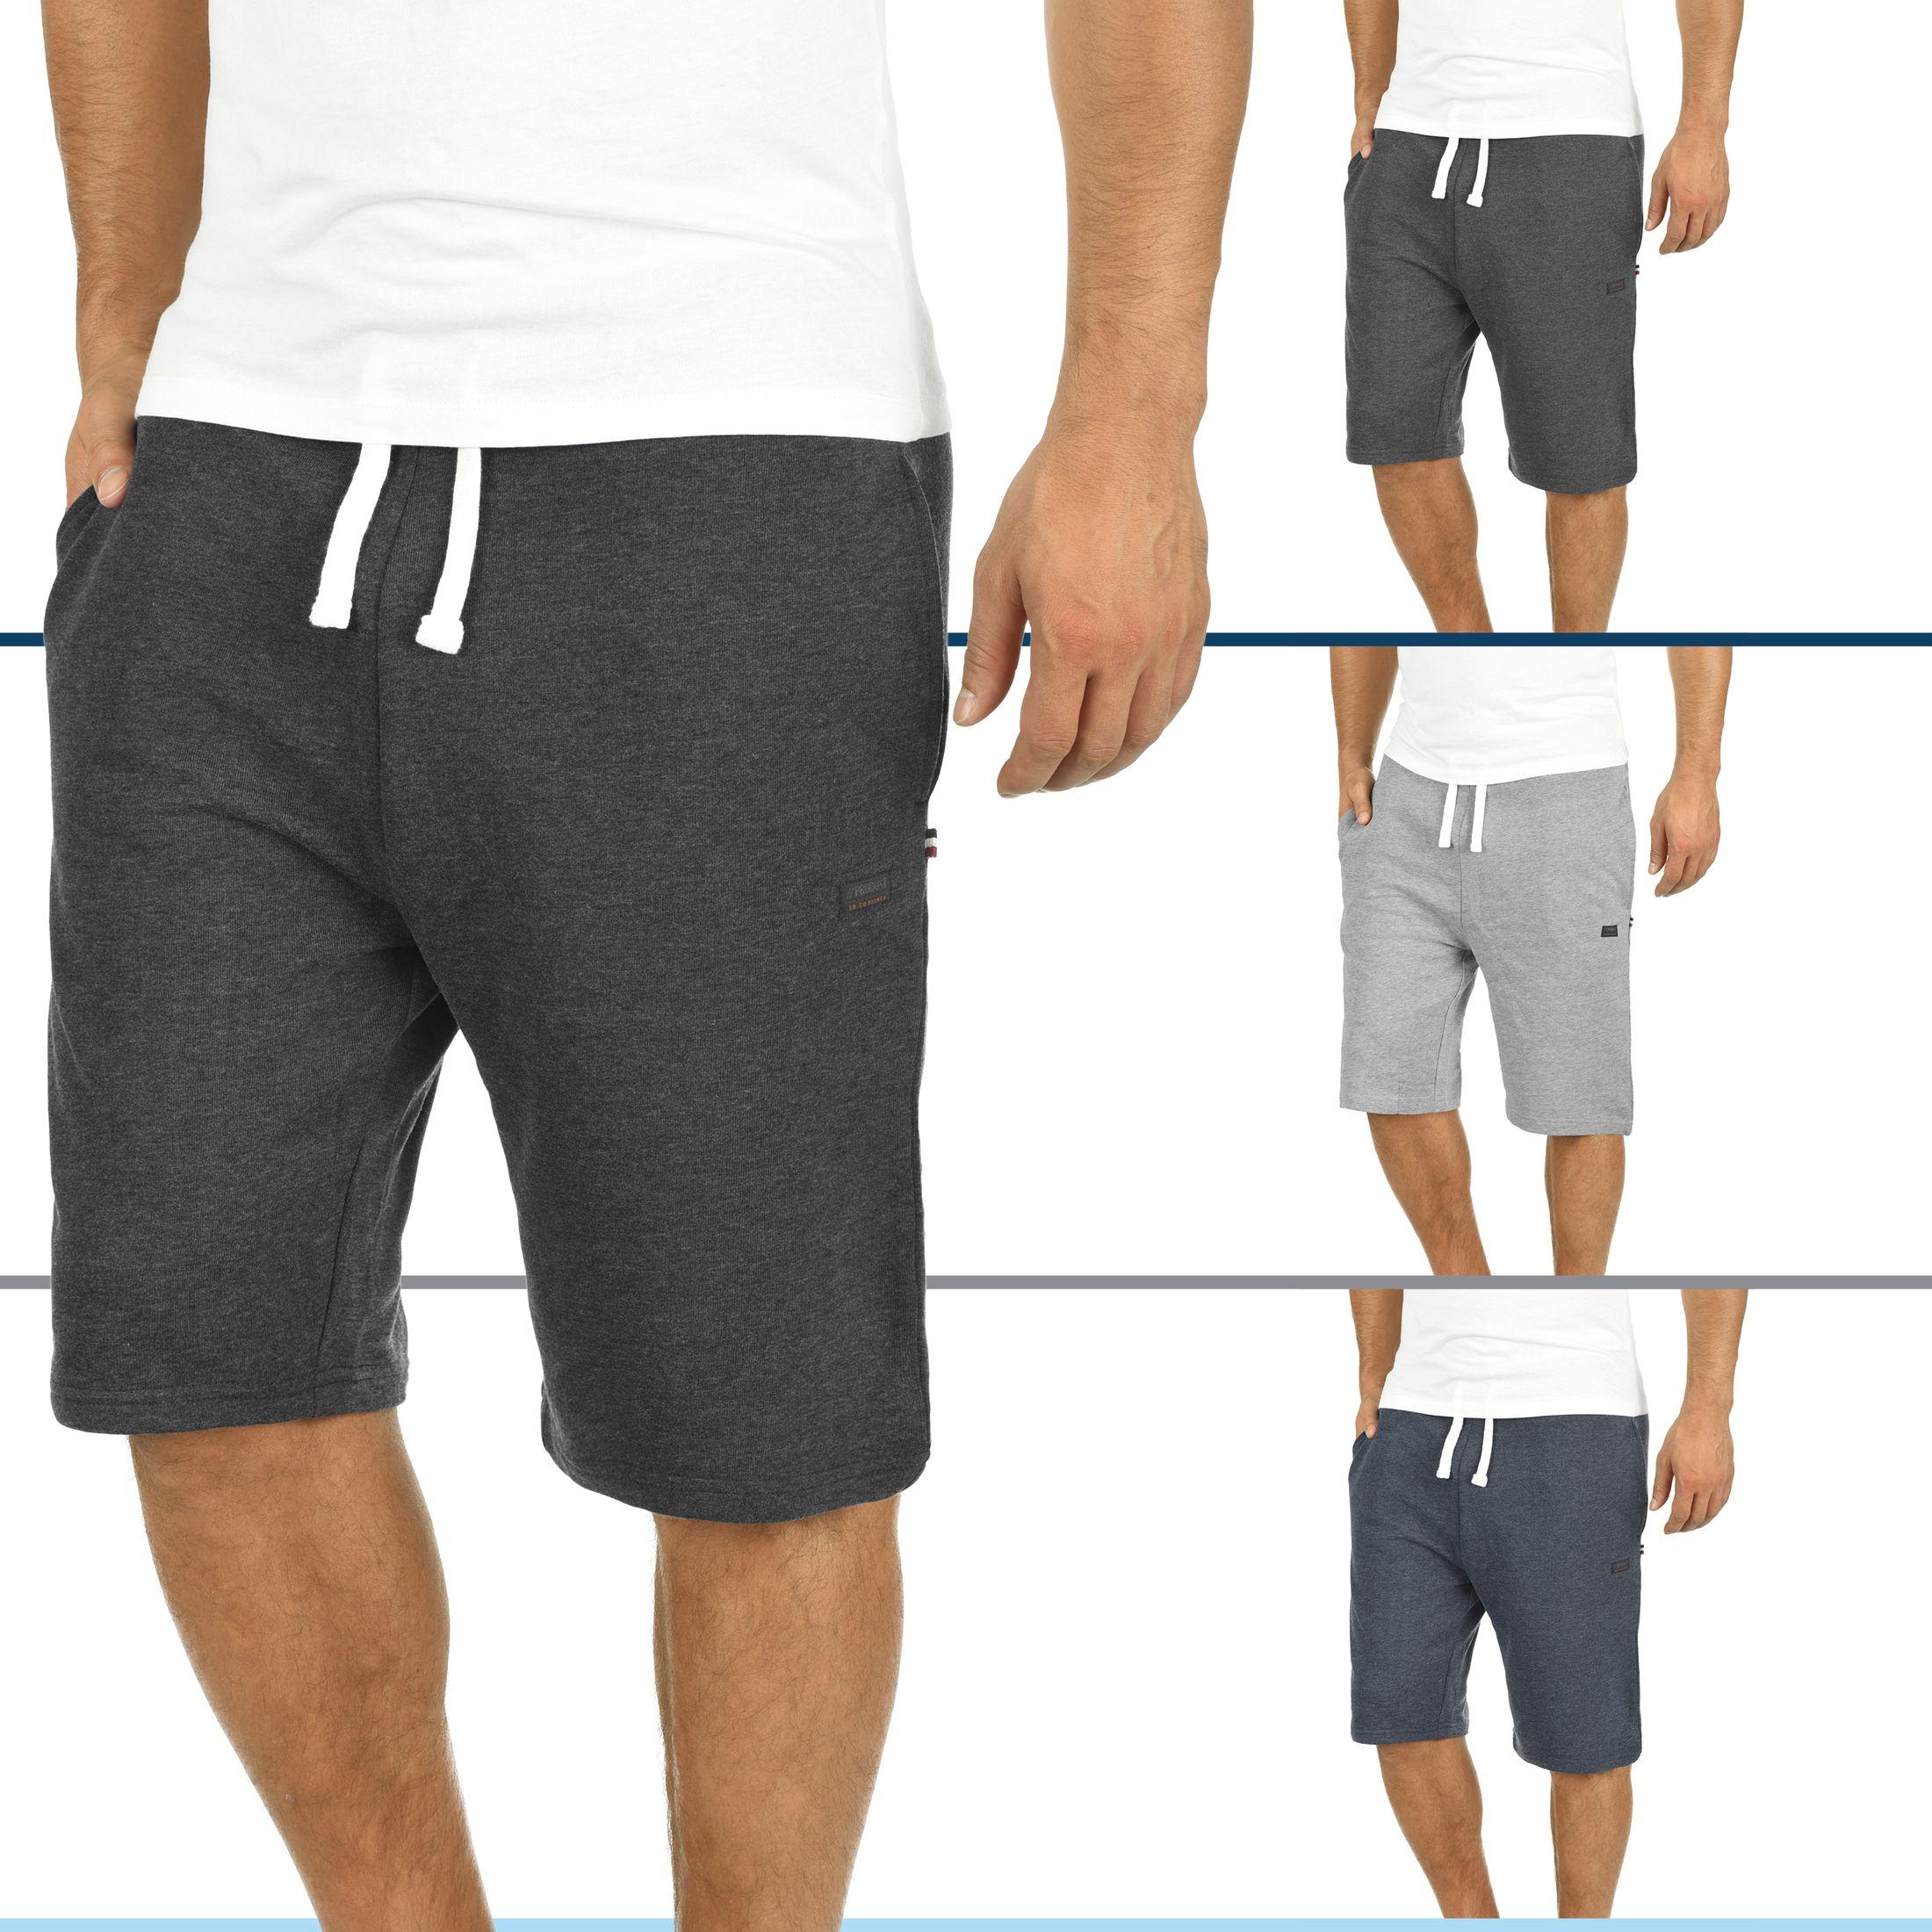 PRODUKT Jeromé Basic Sweat Shorts Fitnessshorts kurze Hose